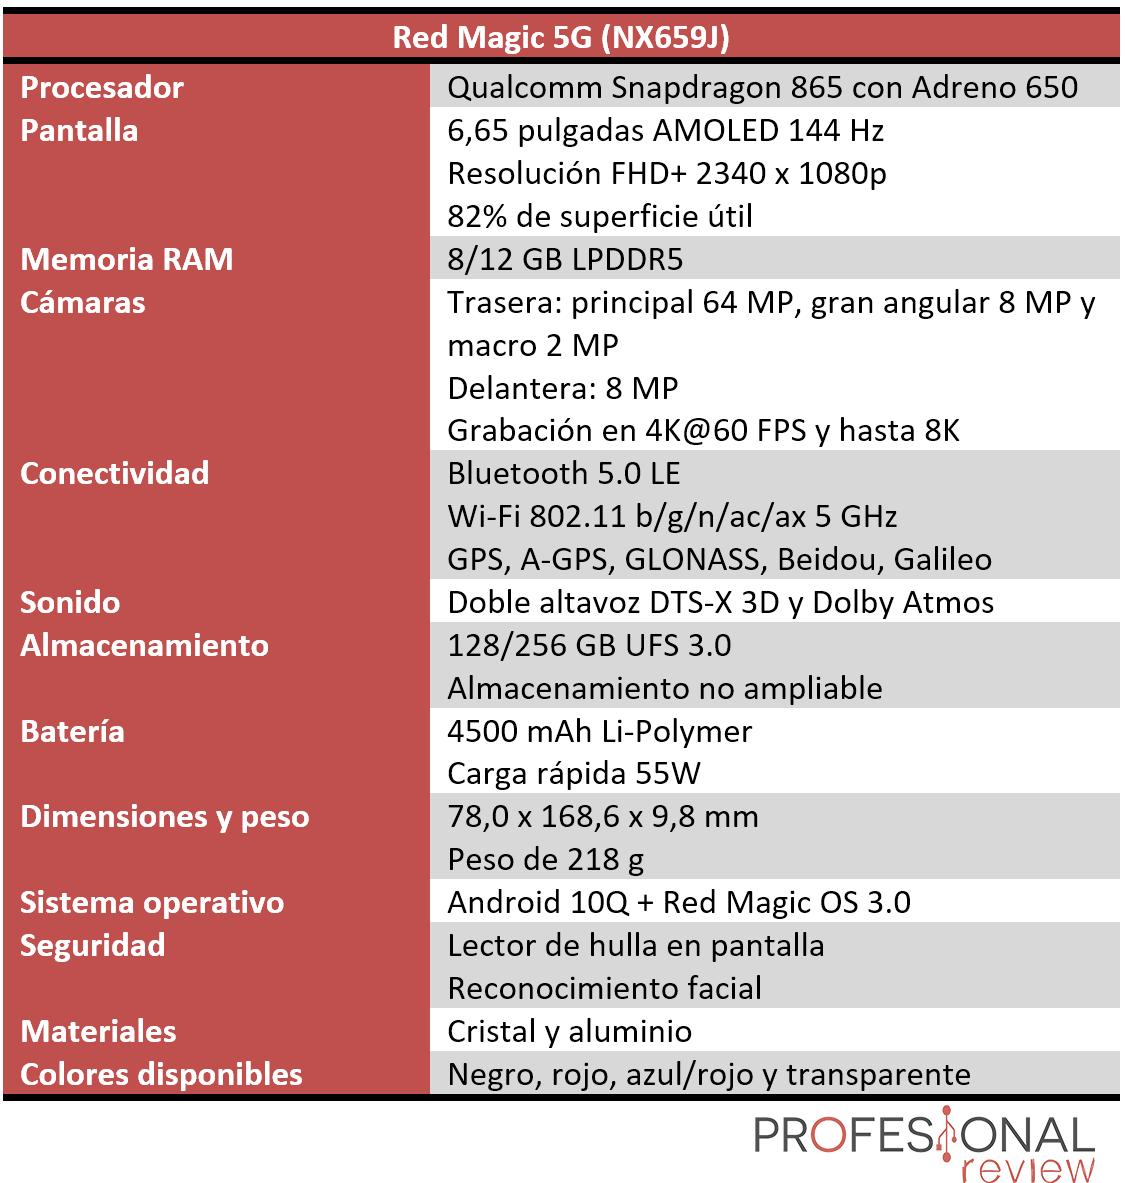 Red Magic 5G Características